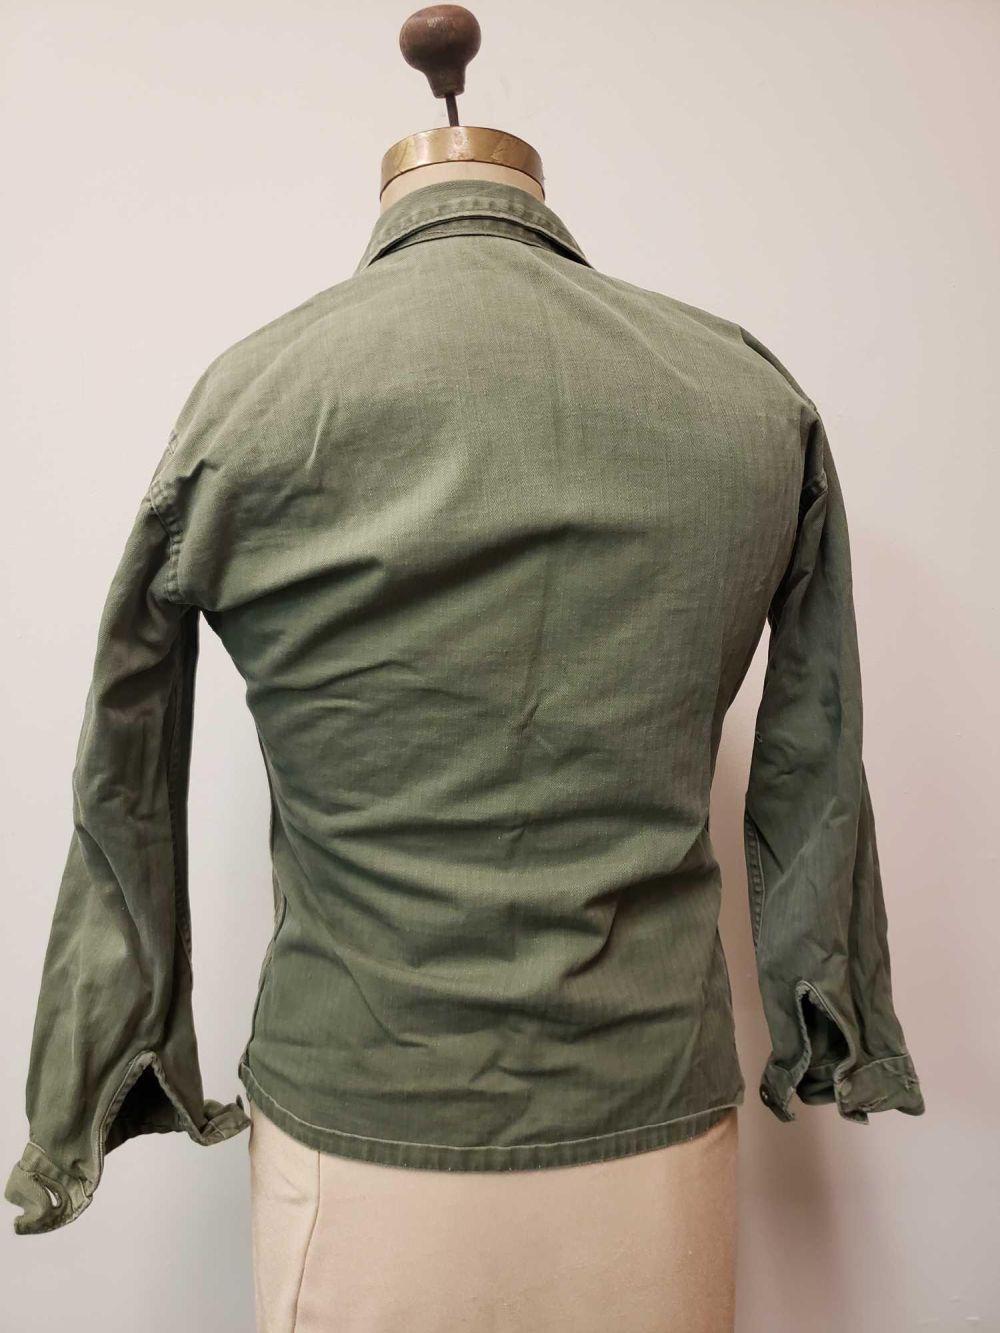 Lot 91: US Marine Corp Vintage Utility Jacket